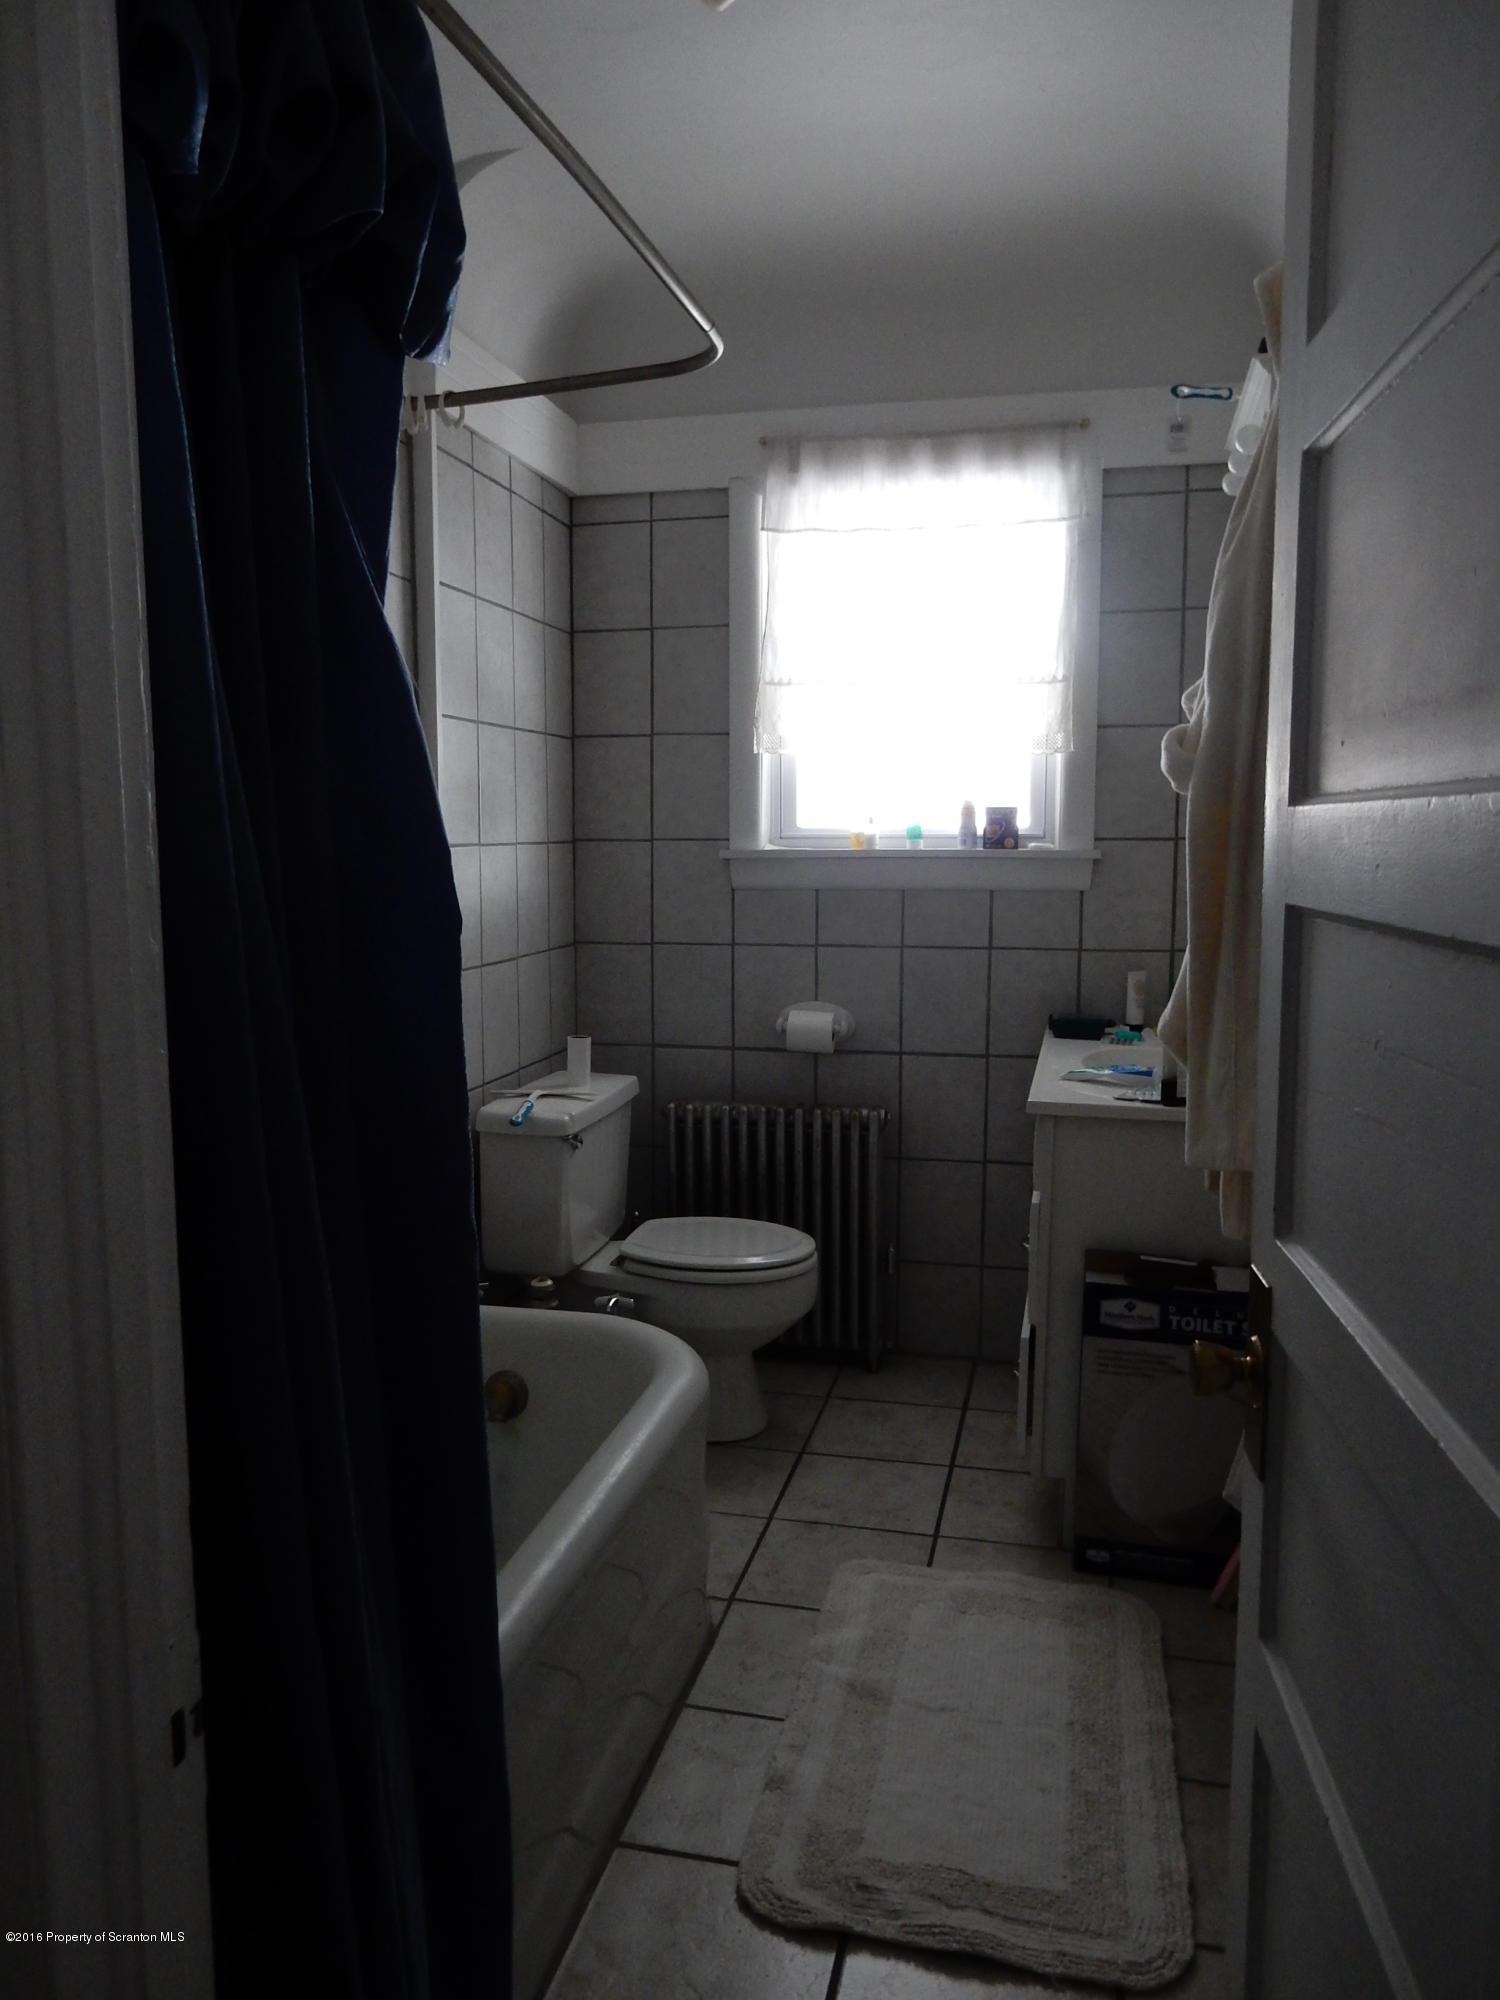 534 Drinker Street, Dunmore, Pennsylvania 18512, ,2 BathroomsBathrooms,Commercial,For Sale,Drinker Street,16-1201